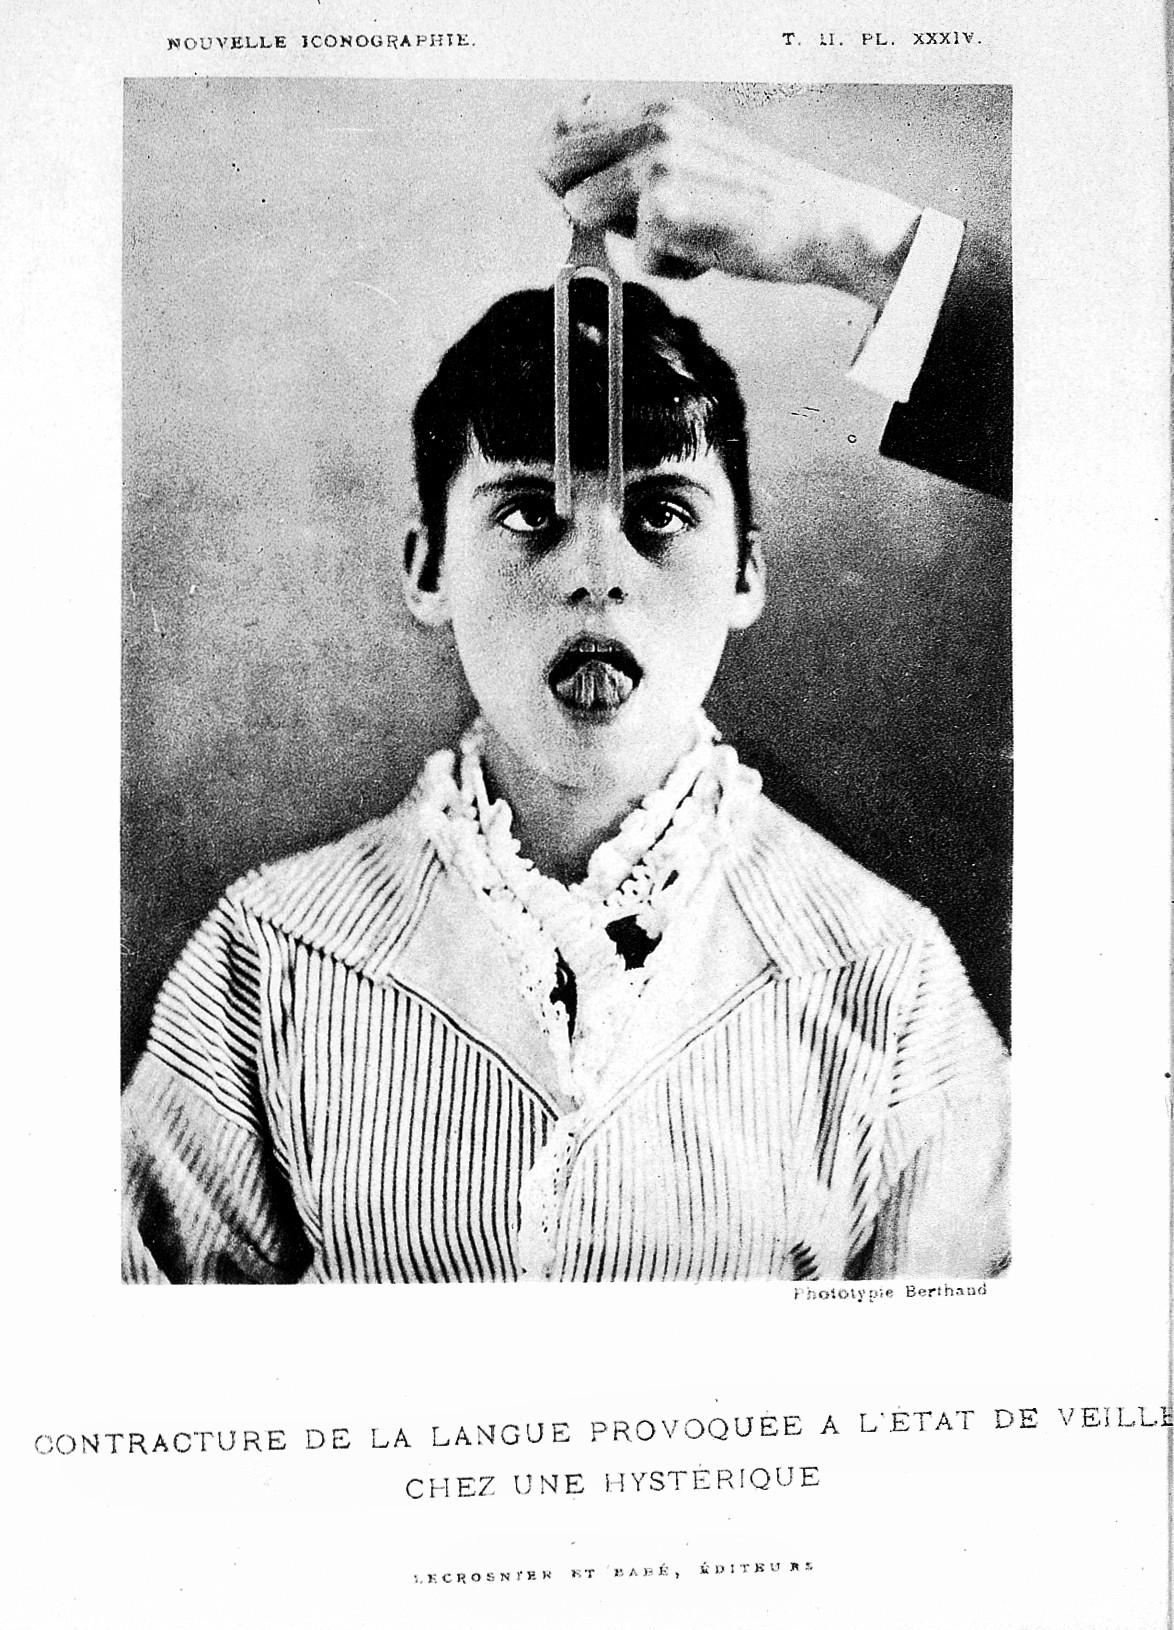 L0020546 Paul Richer, 'Gonflement du cou chez un hysterique' Credit: Wellcome Library, London. Wellcome Images images@wellcome.ac.uk http://wellcomeimages.org 'Contracture... provoquee l'etat de veille...' Gonflement du cou chez un hysterique Nouvelle iconographie de la Salpetriere Paul Richer Published: 1889 Copyrighted work available under Creative Commons Attribution only licence CC BY 4.0 http://creativecommons.org/licenses/by/4.0/